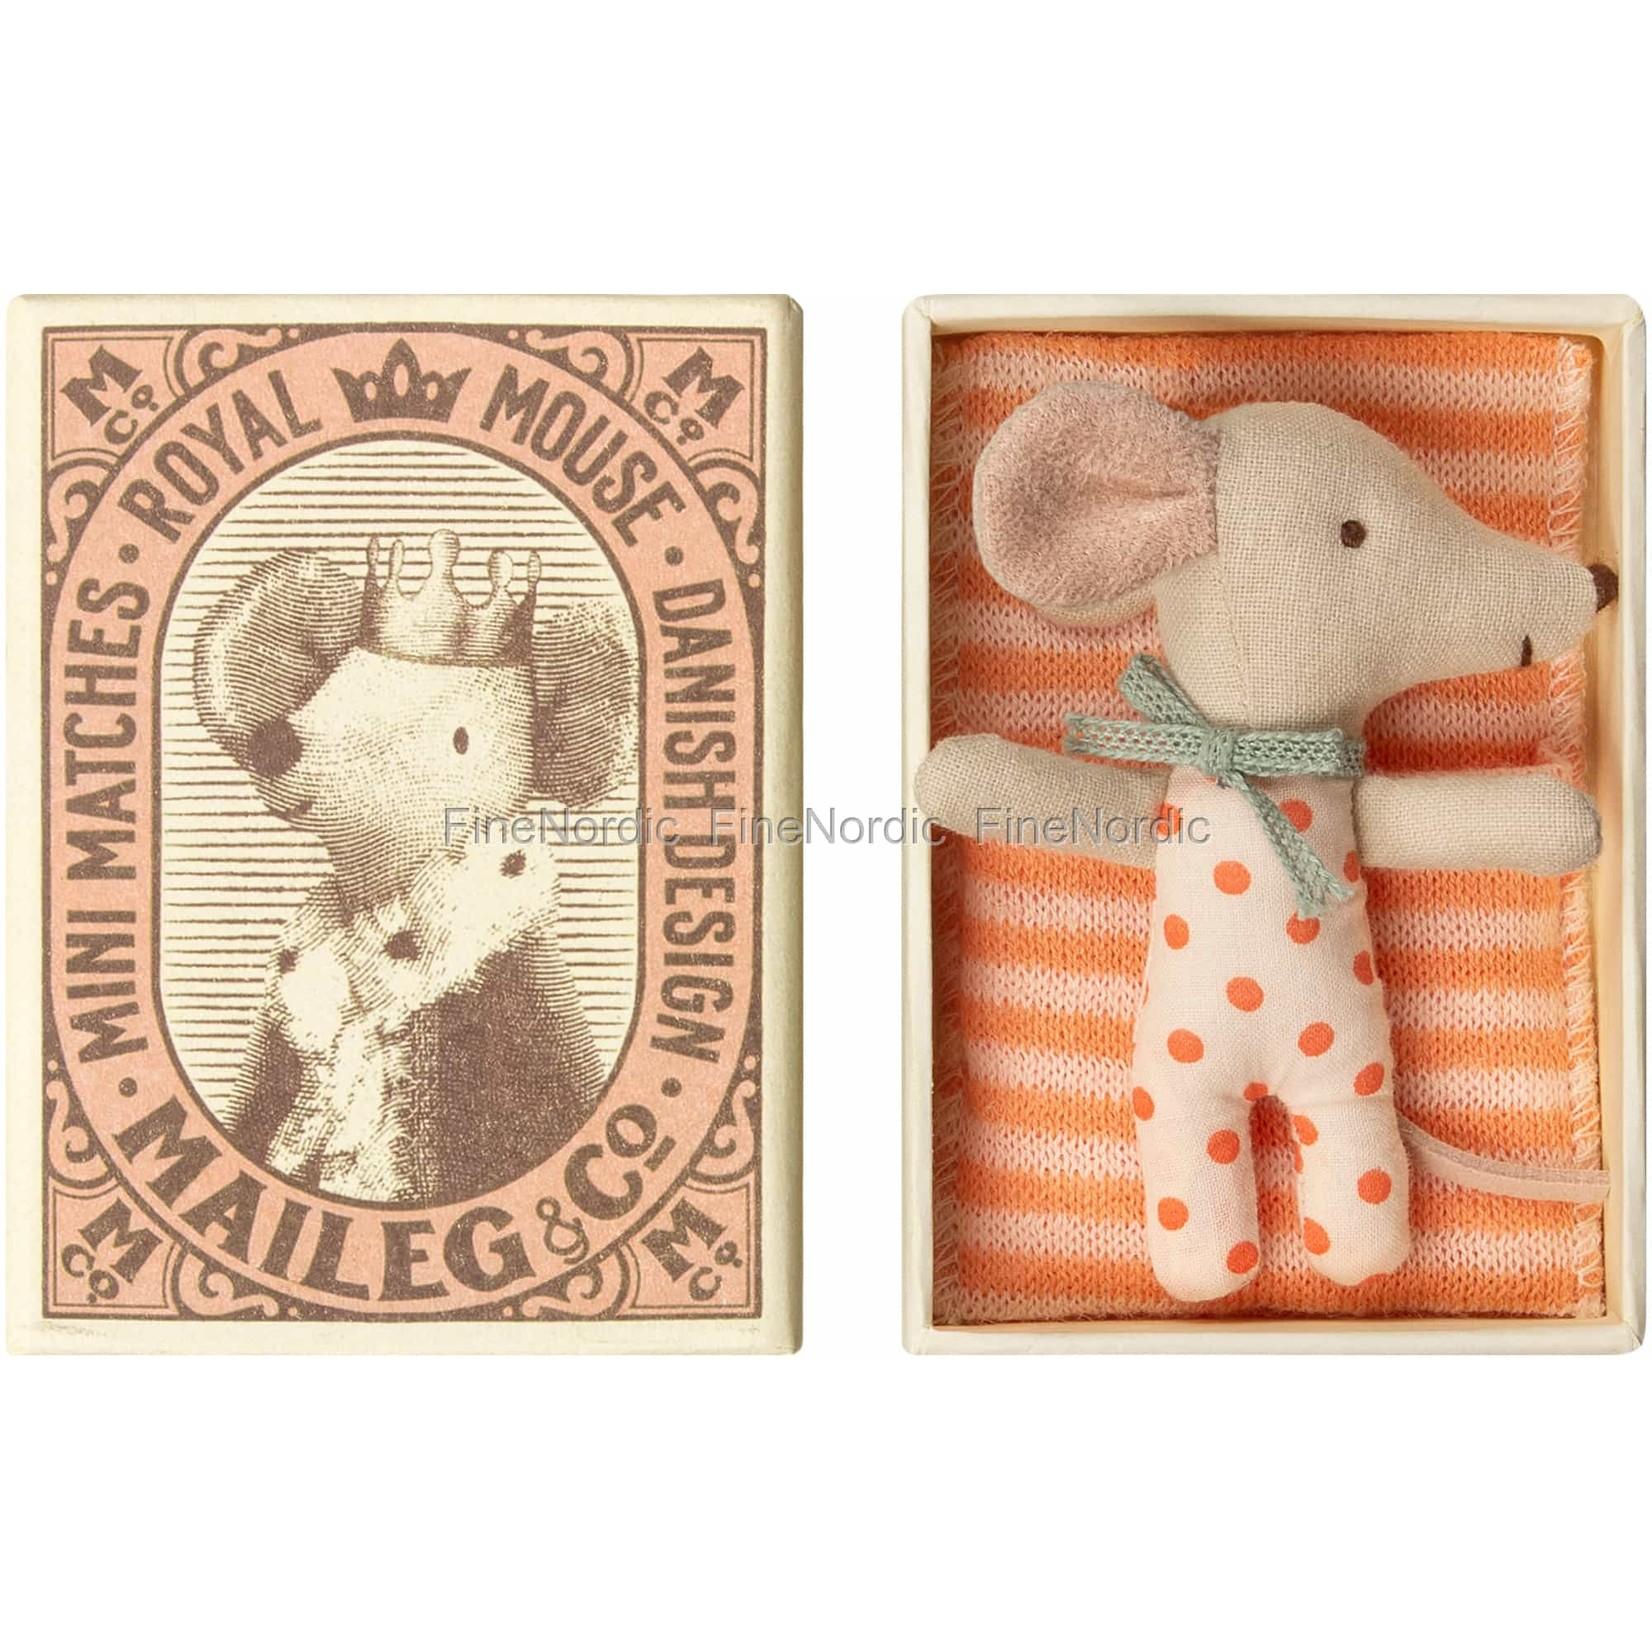 Maileg Baby Mouse, Sleepy/wakey in Matchbox - Girl